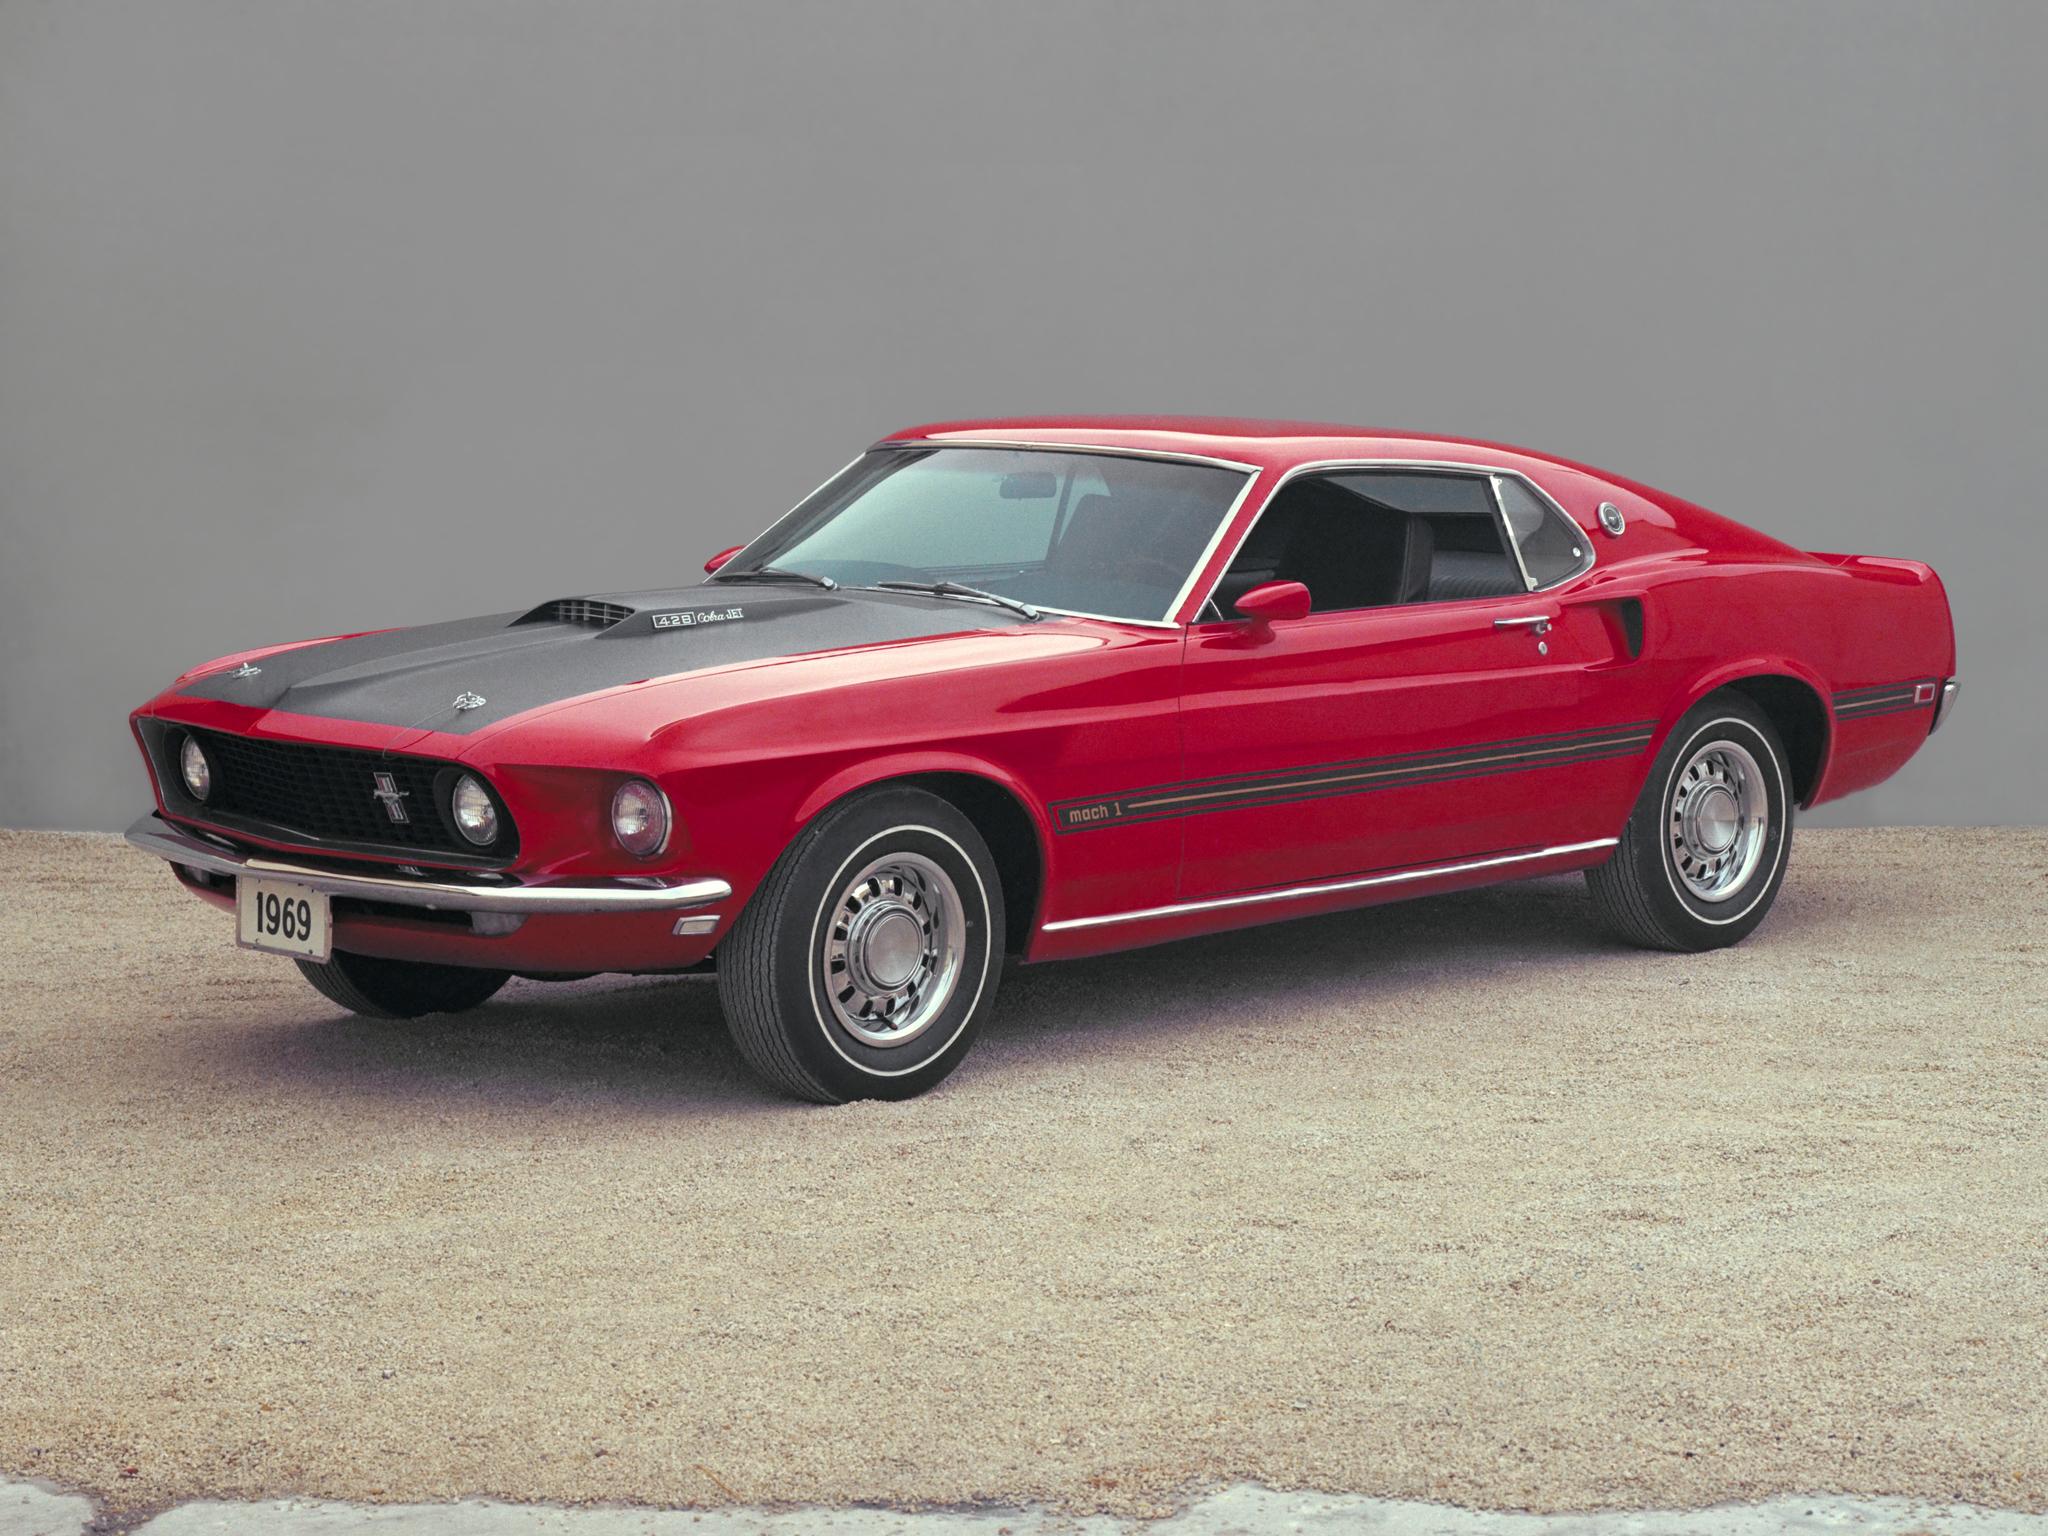 1969 Mustang Mach 1 Wallpapers